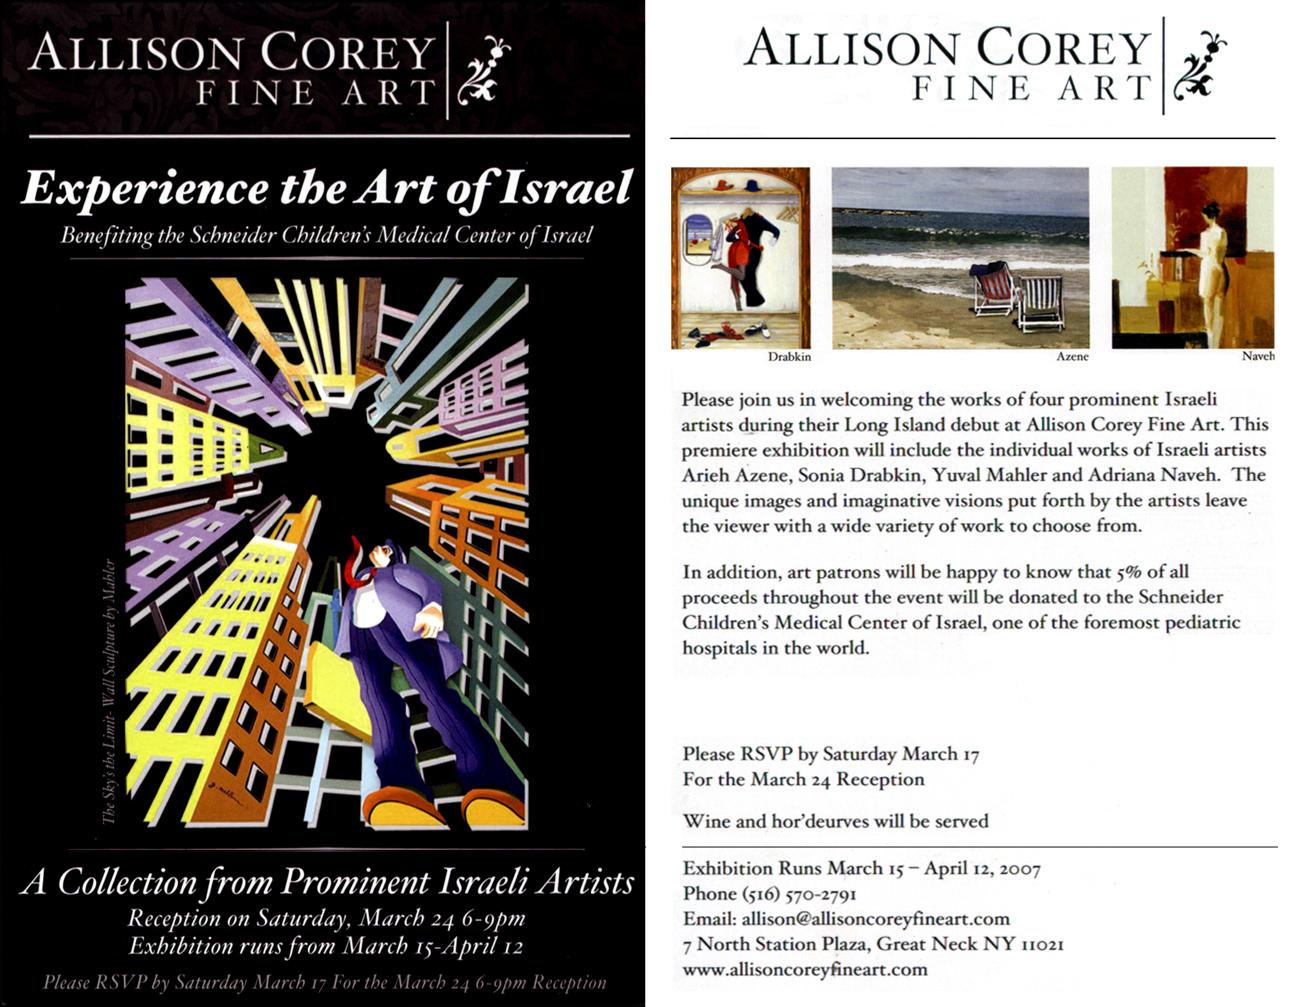 Allison Corey Fine Art